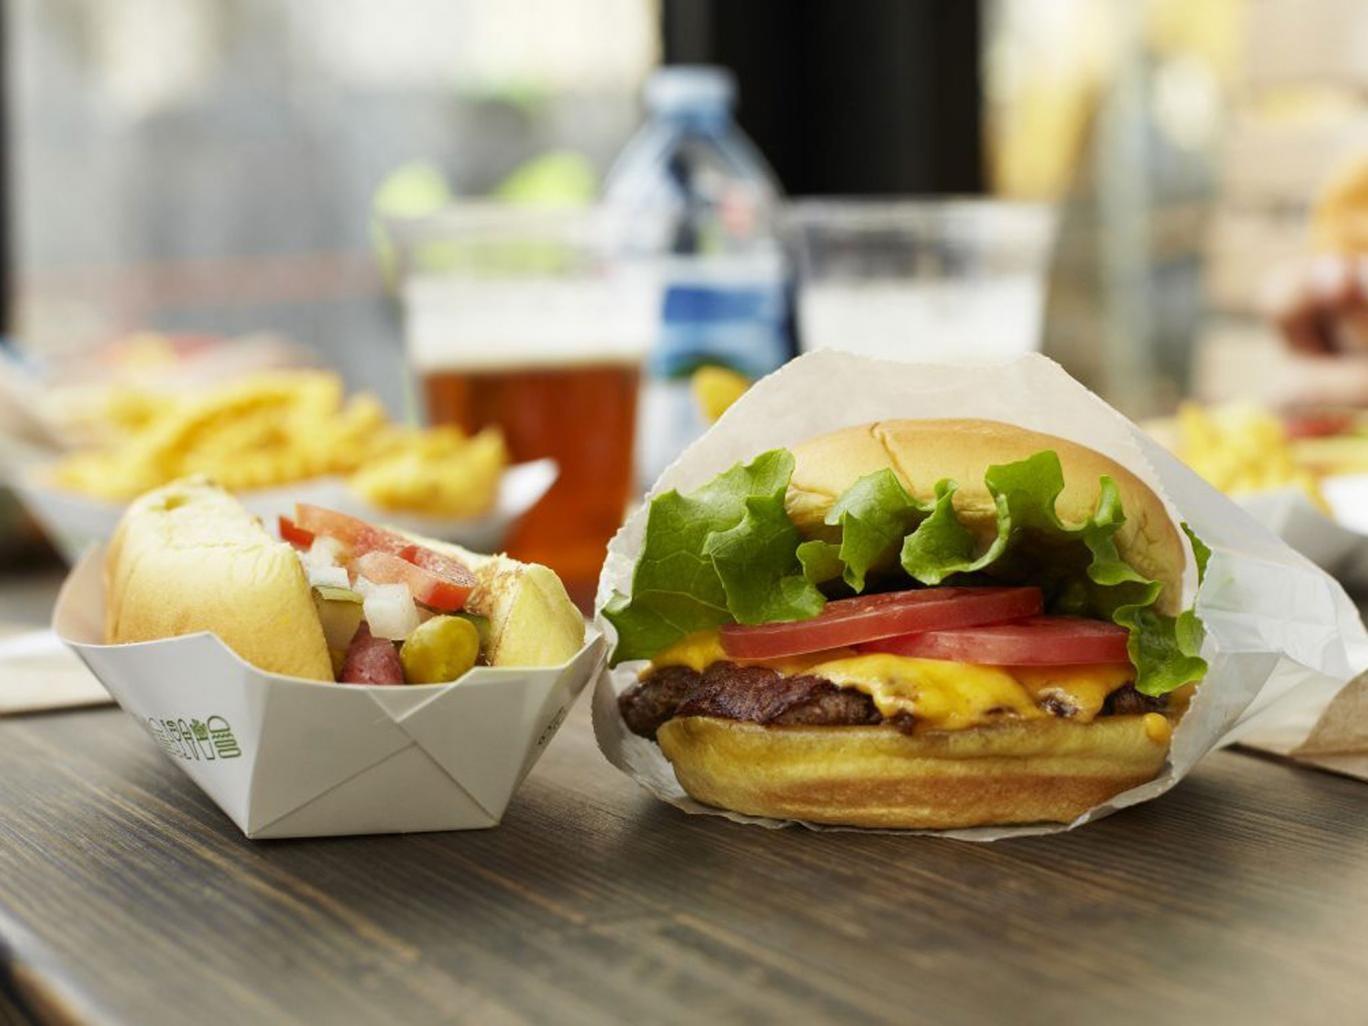 Shake Shack: Coming next to Britain's burgeoning burger market